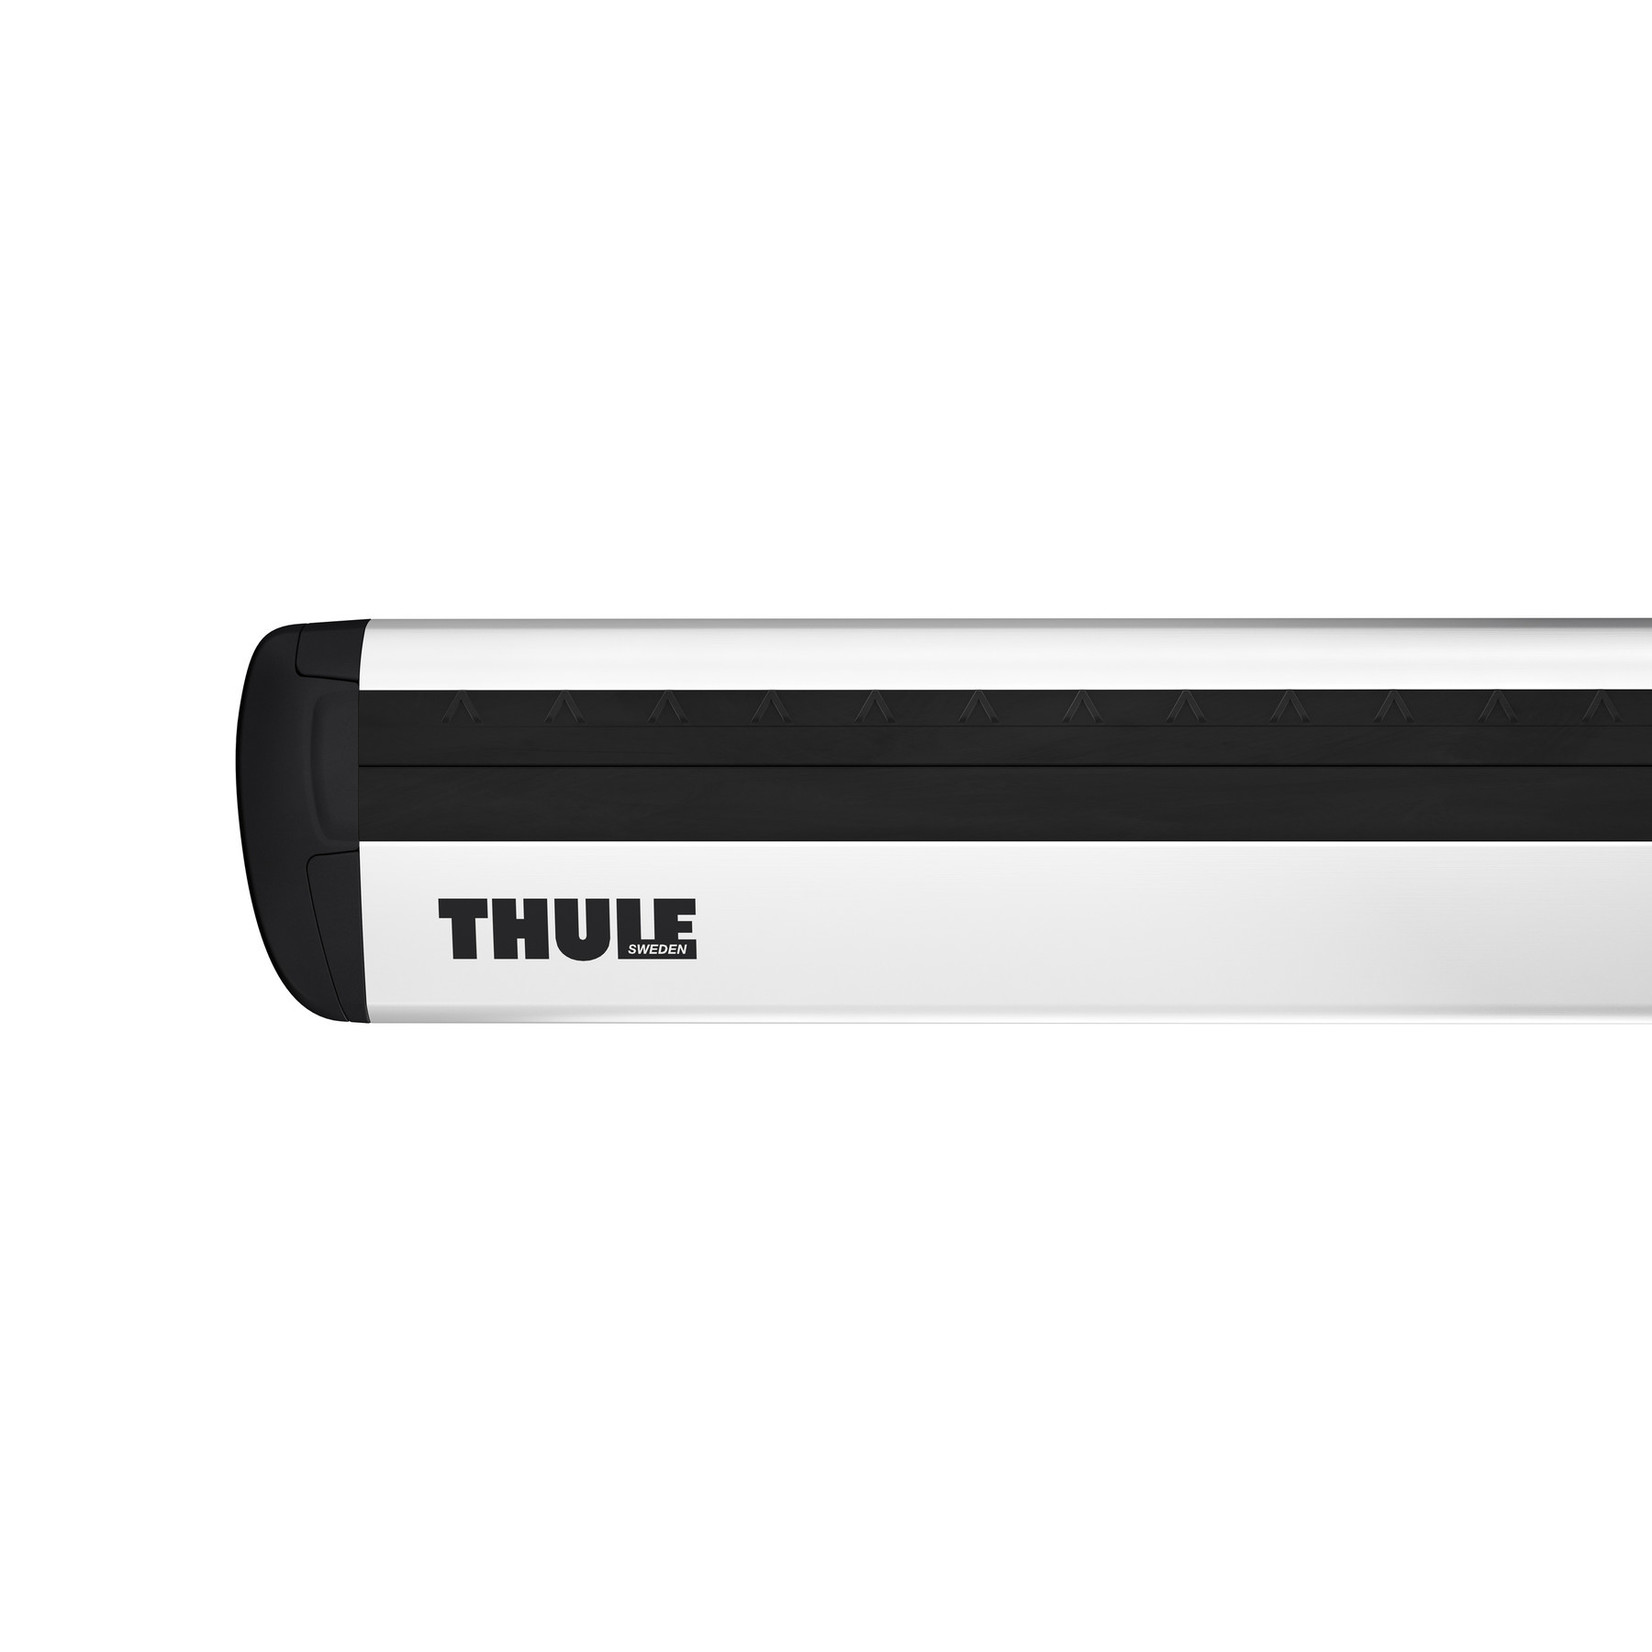 THULE Wingbar Evo - Silver 118 cm